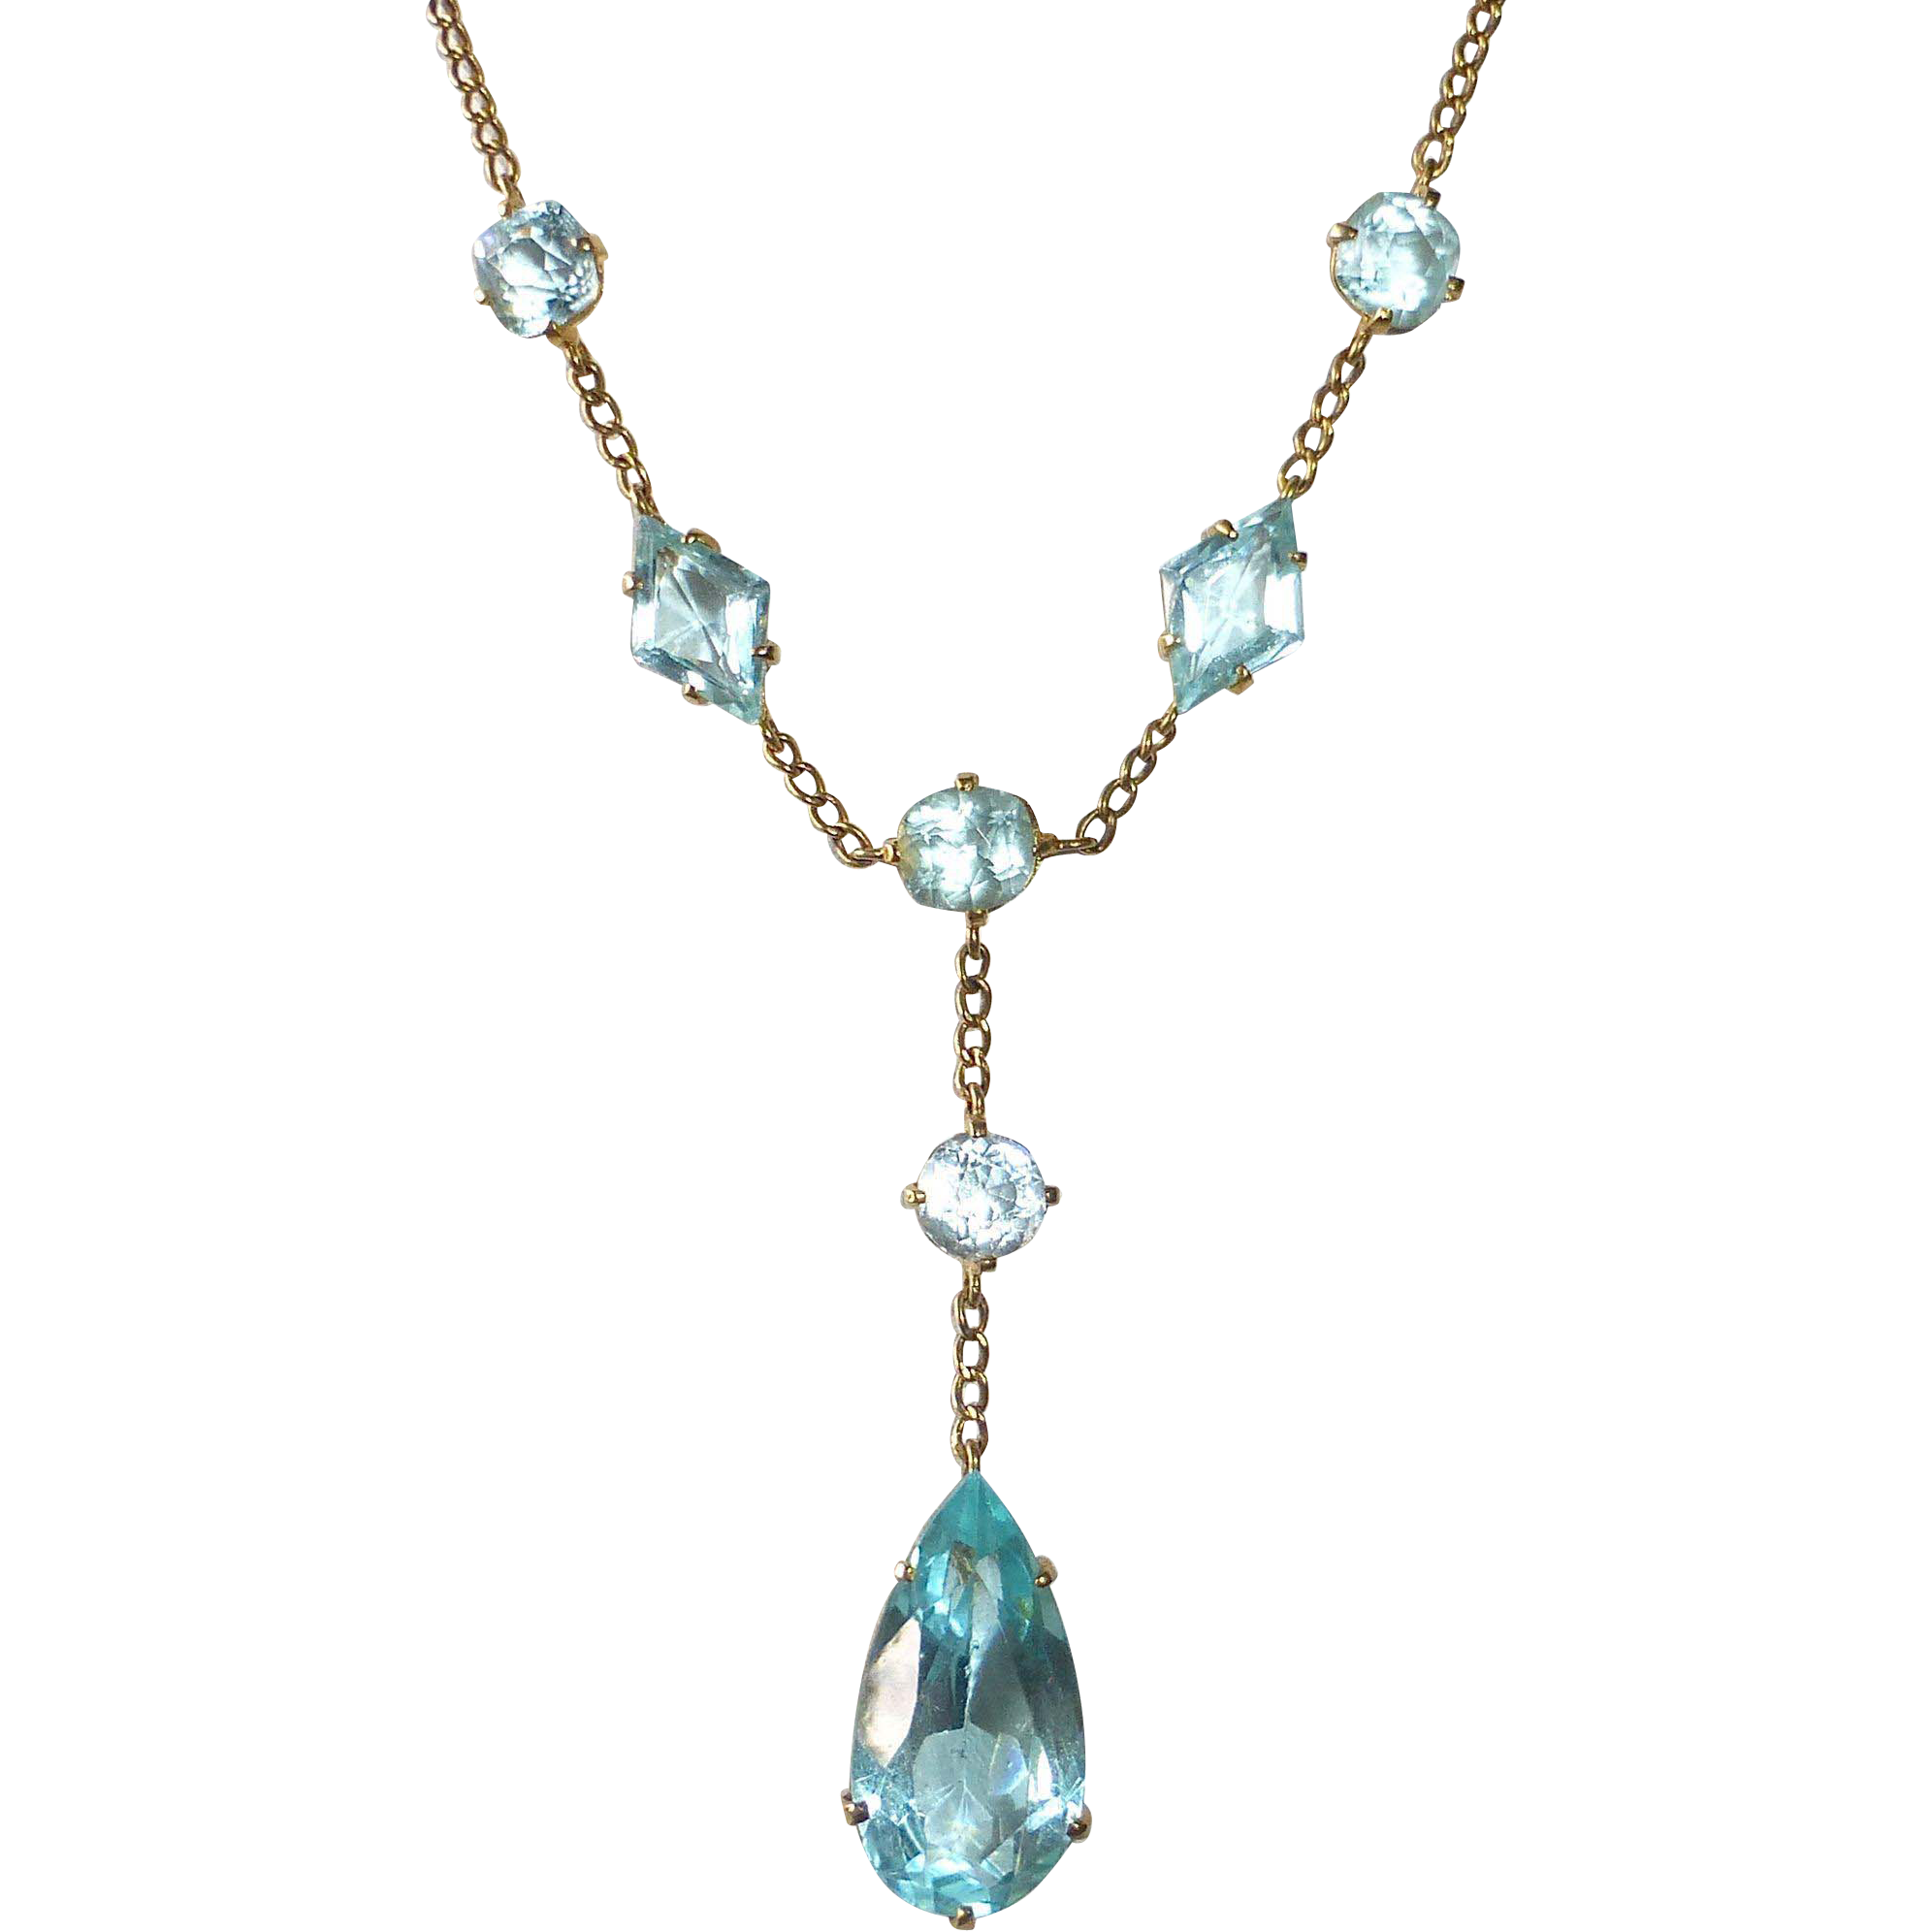 Antique Edwardian 10k Yellow Gold Necklace Aqua Paste Jewels